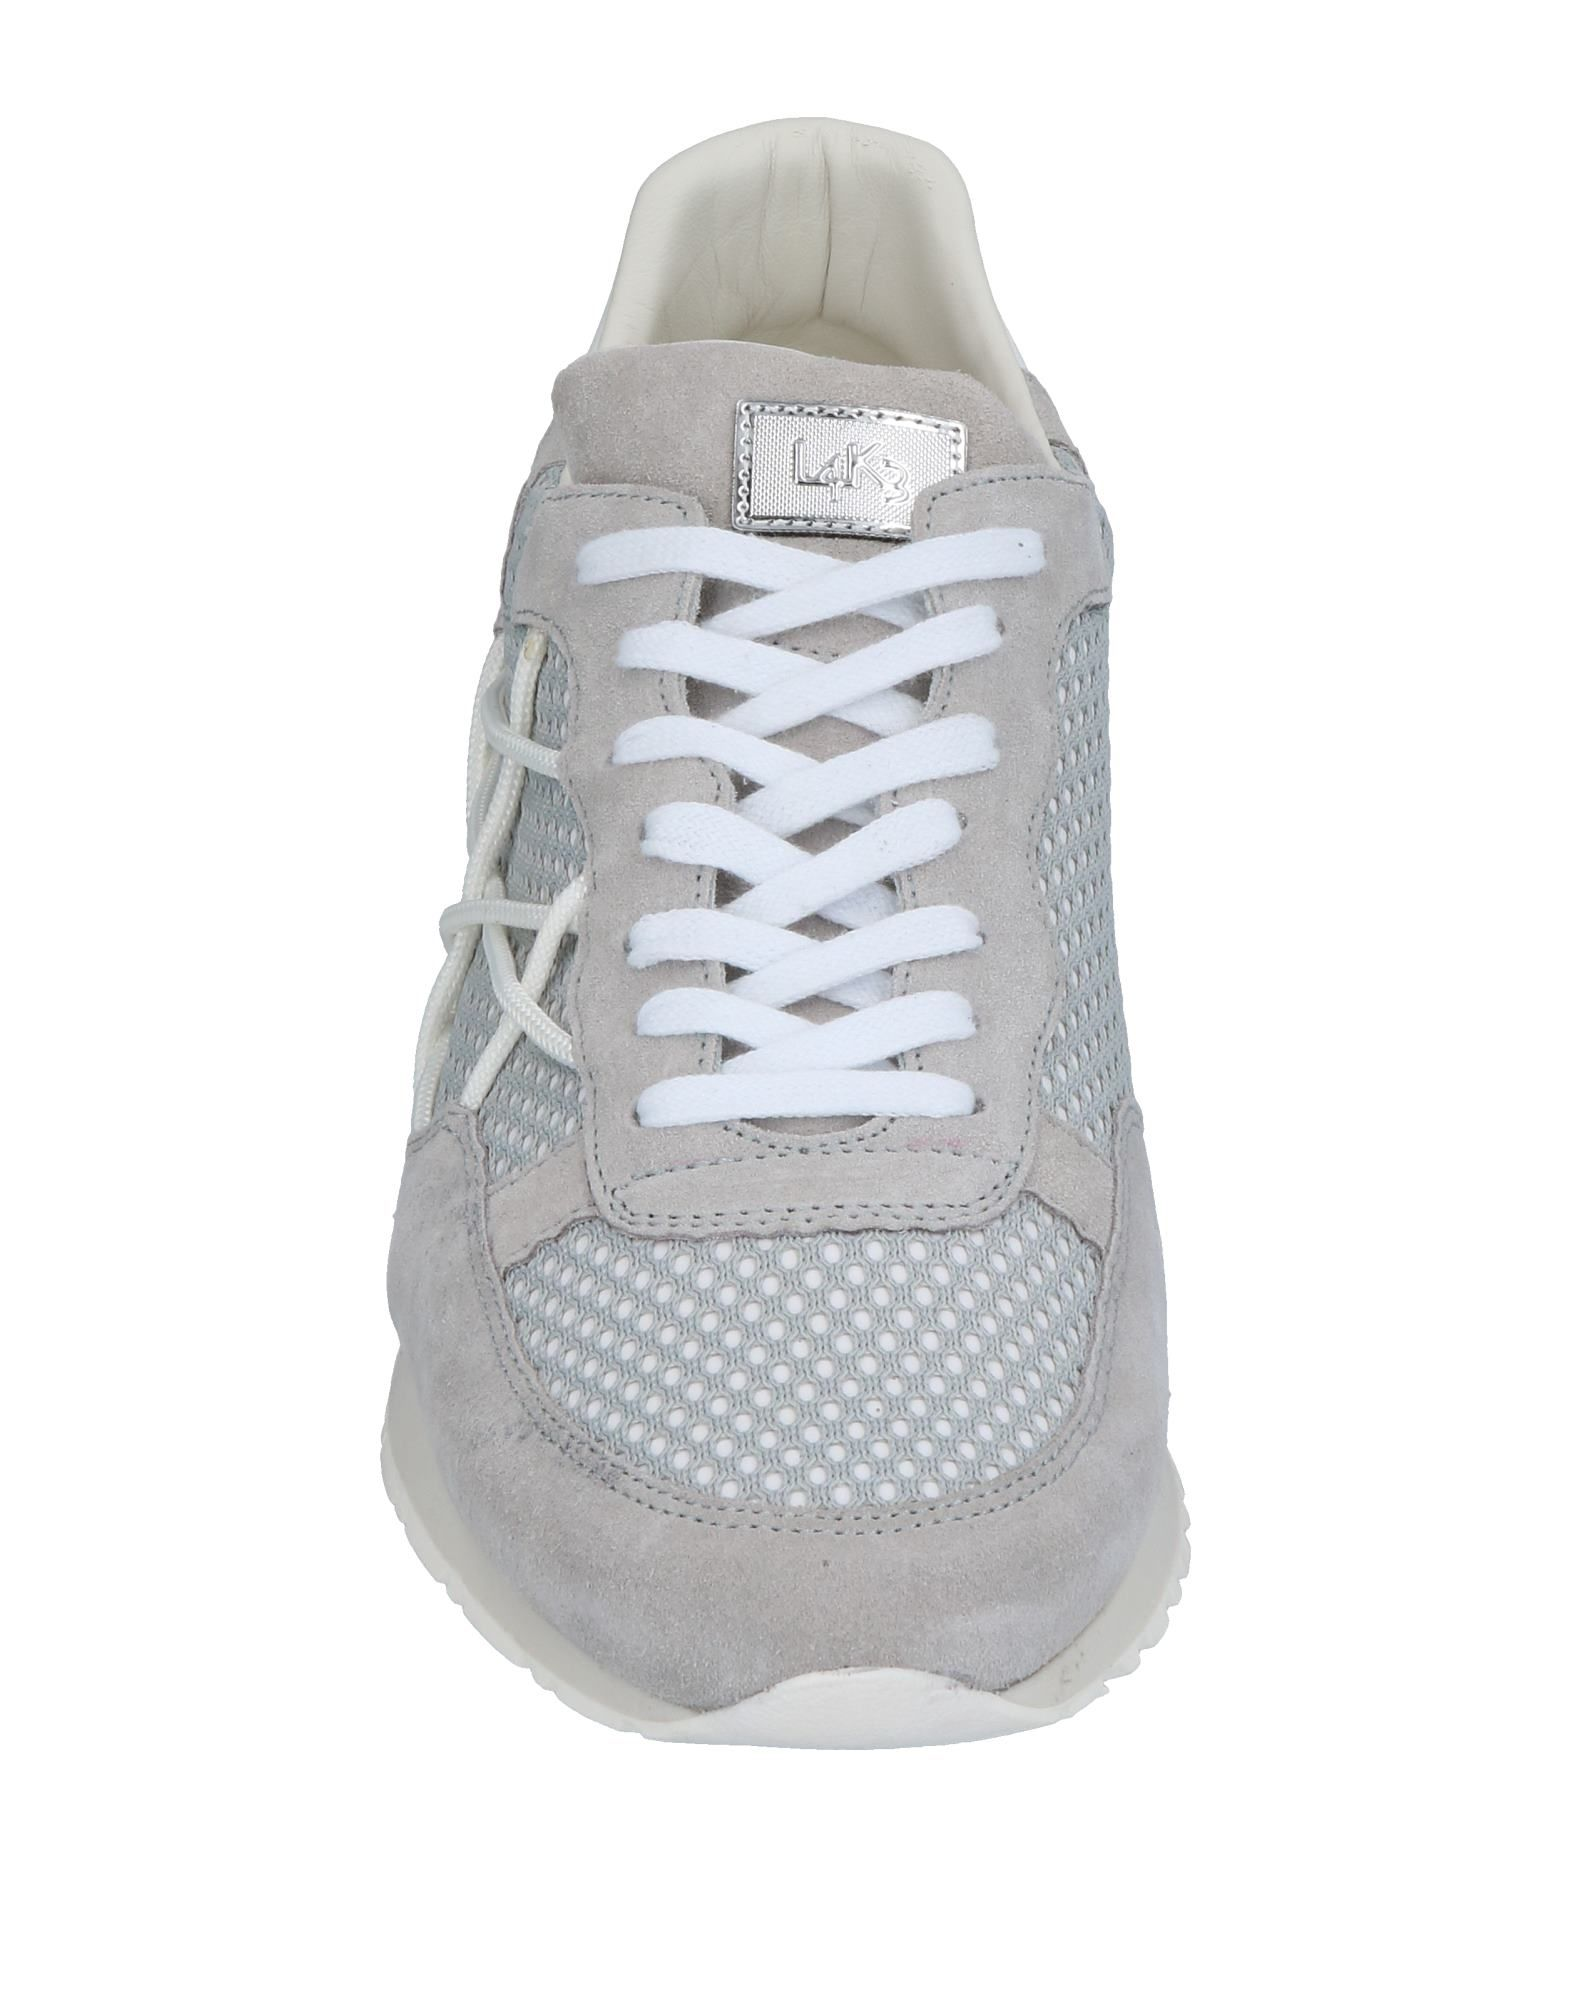 Sneakers L4k3 Homme - Sneakers L4k3 sur